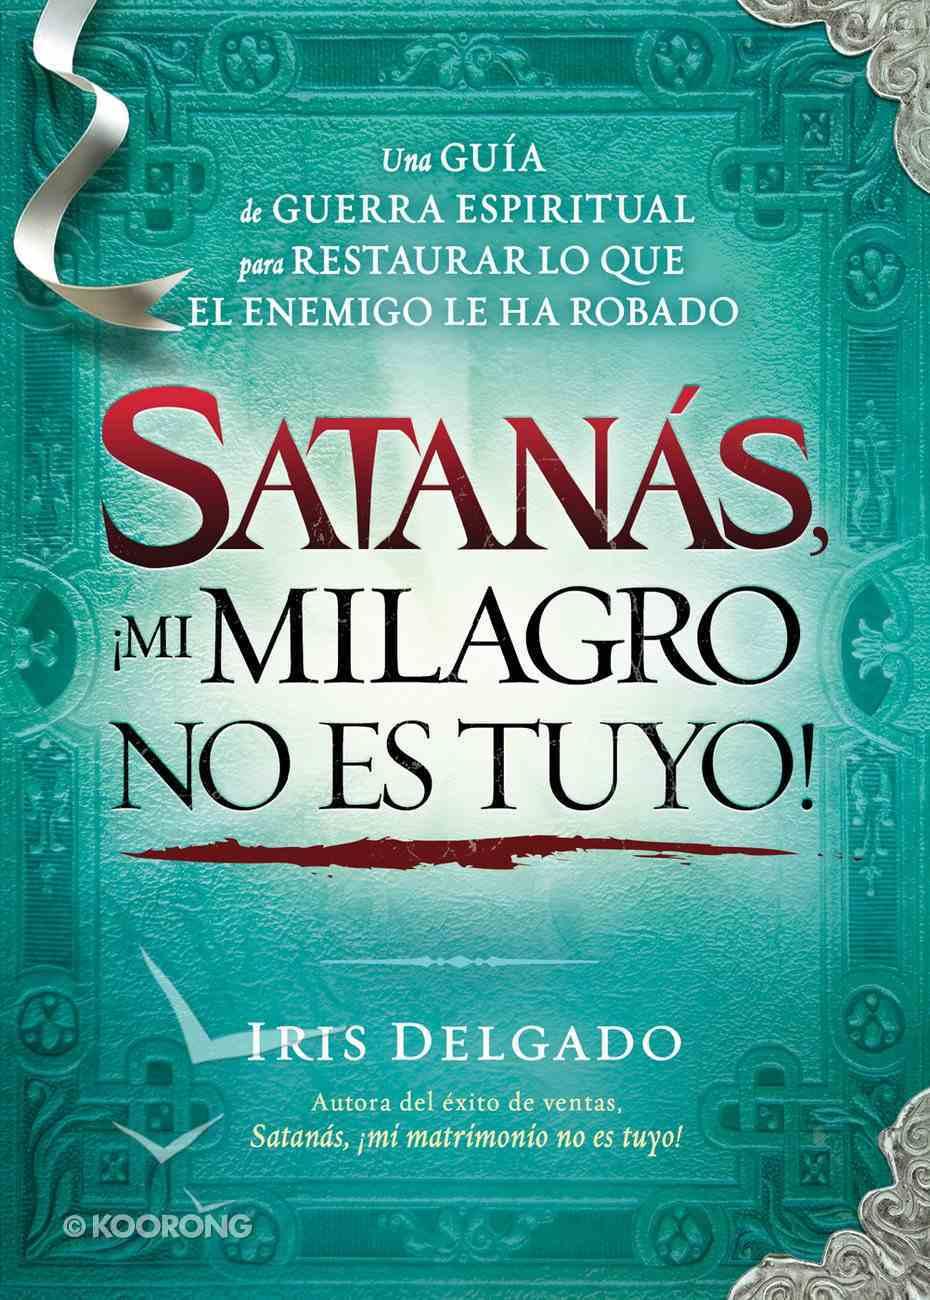 Satanas, No Puedes Quitarme Mi Milagro (Spanish) (Spa) (Satan, You Can't Have My Miracle) eBook